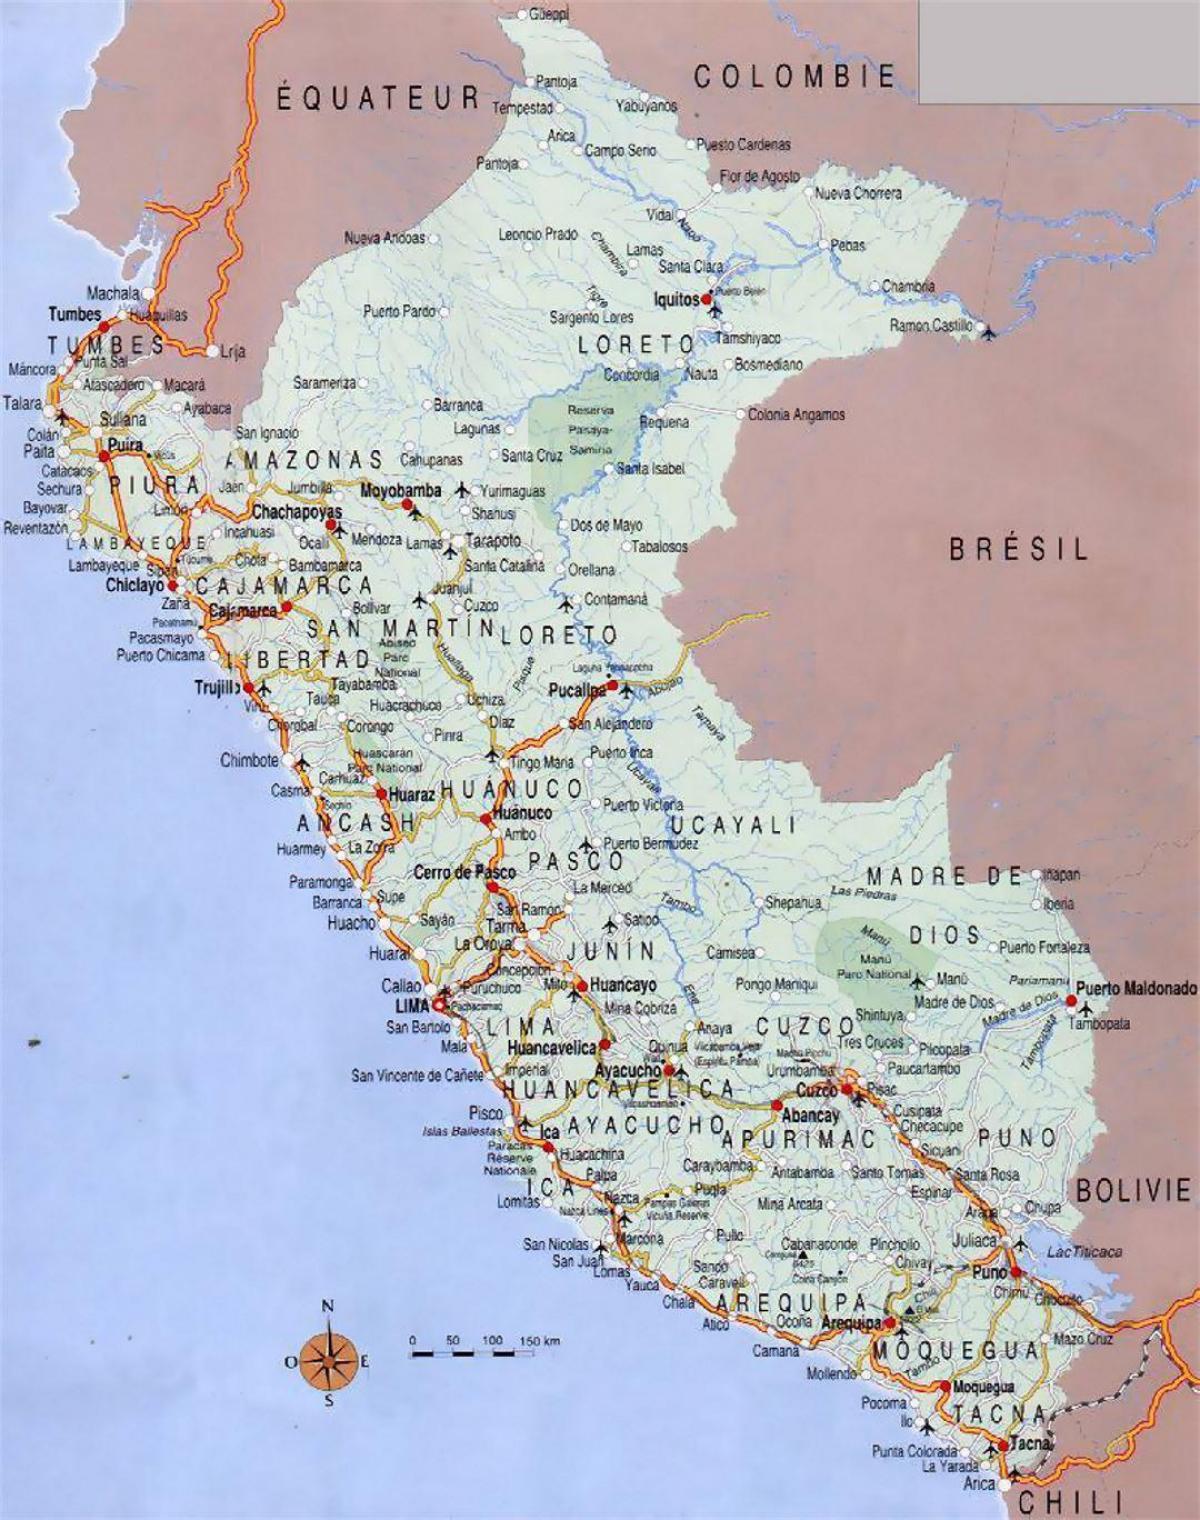 Peru cities map - Map of Peru cities (South America - Americas)